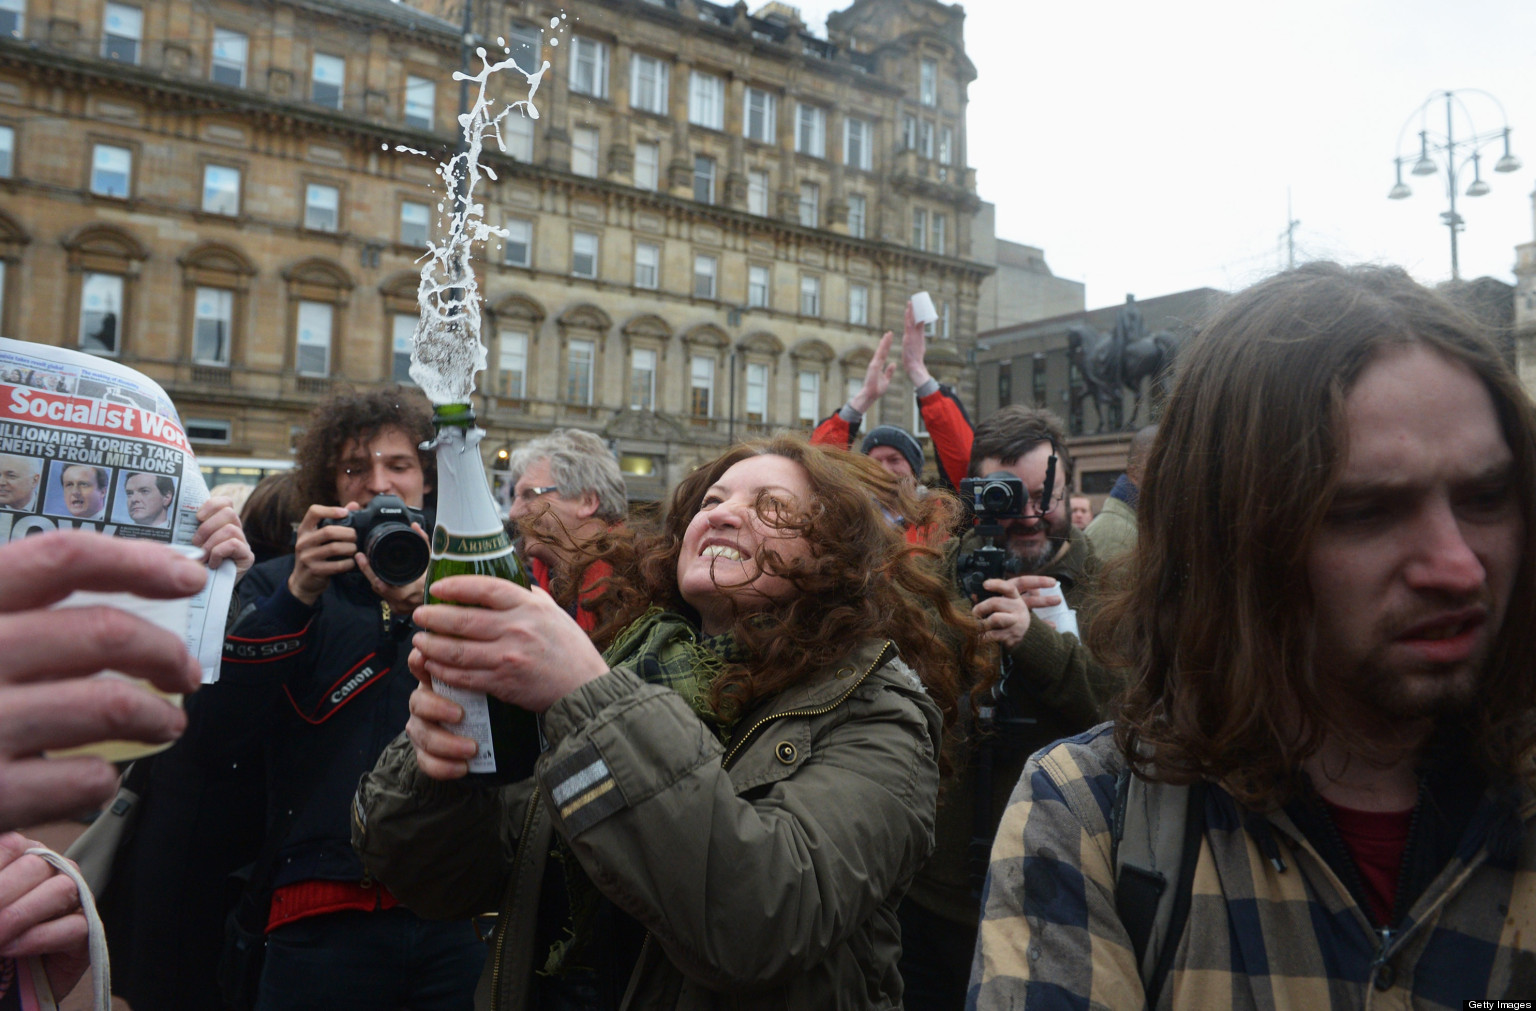 margaret thatcher dead parties  celebrate  pms passing pictures